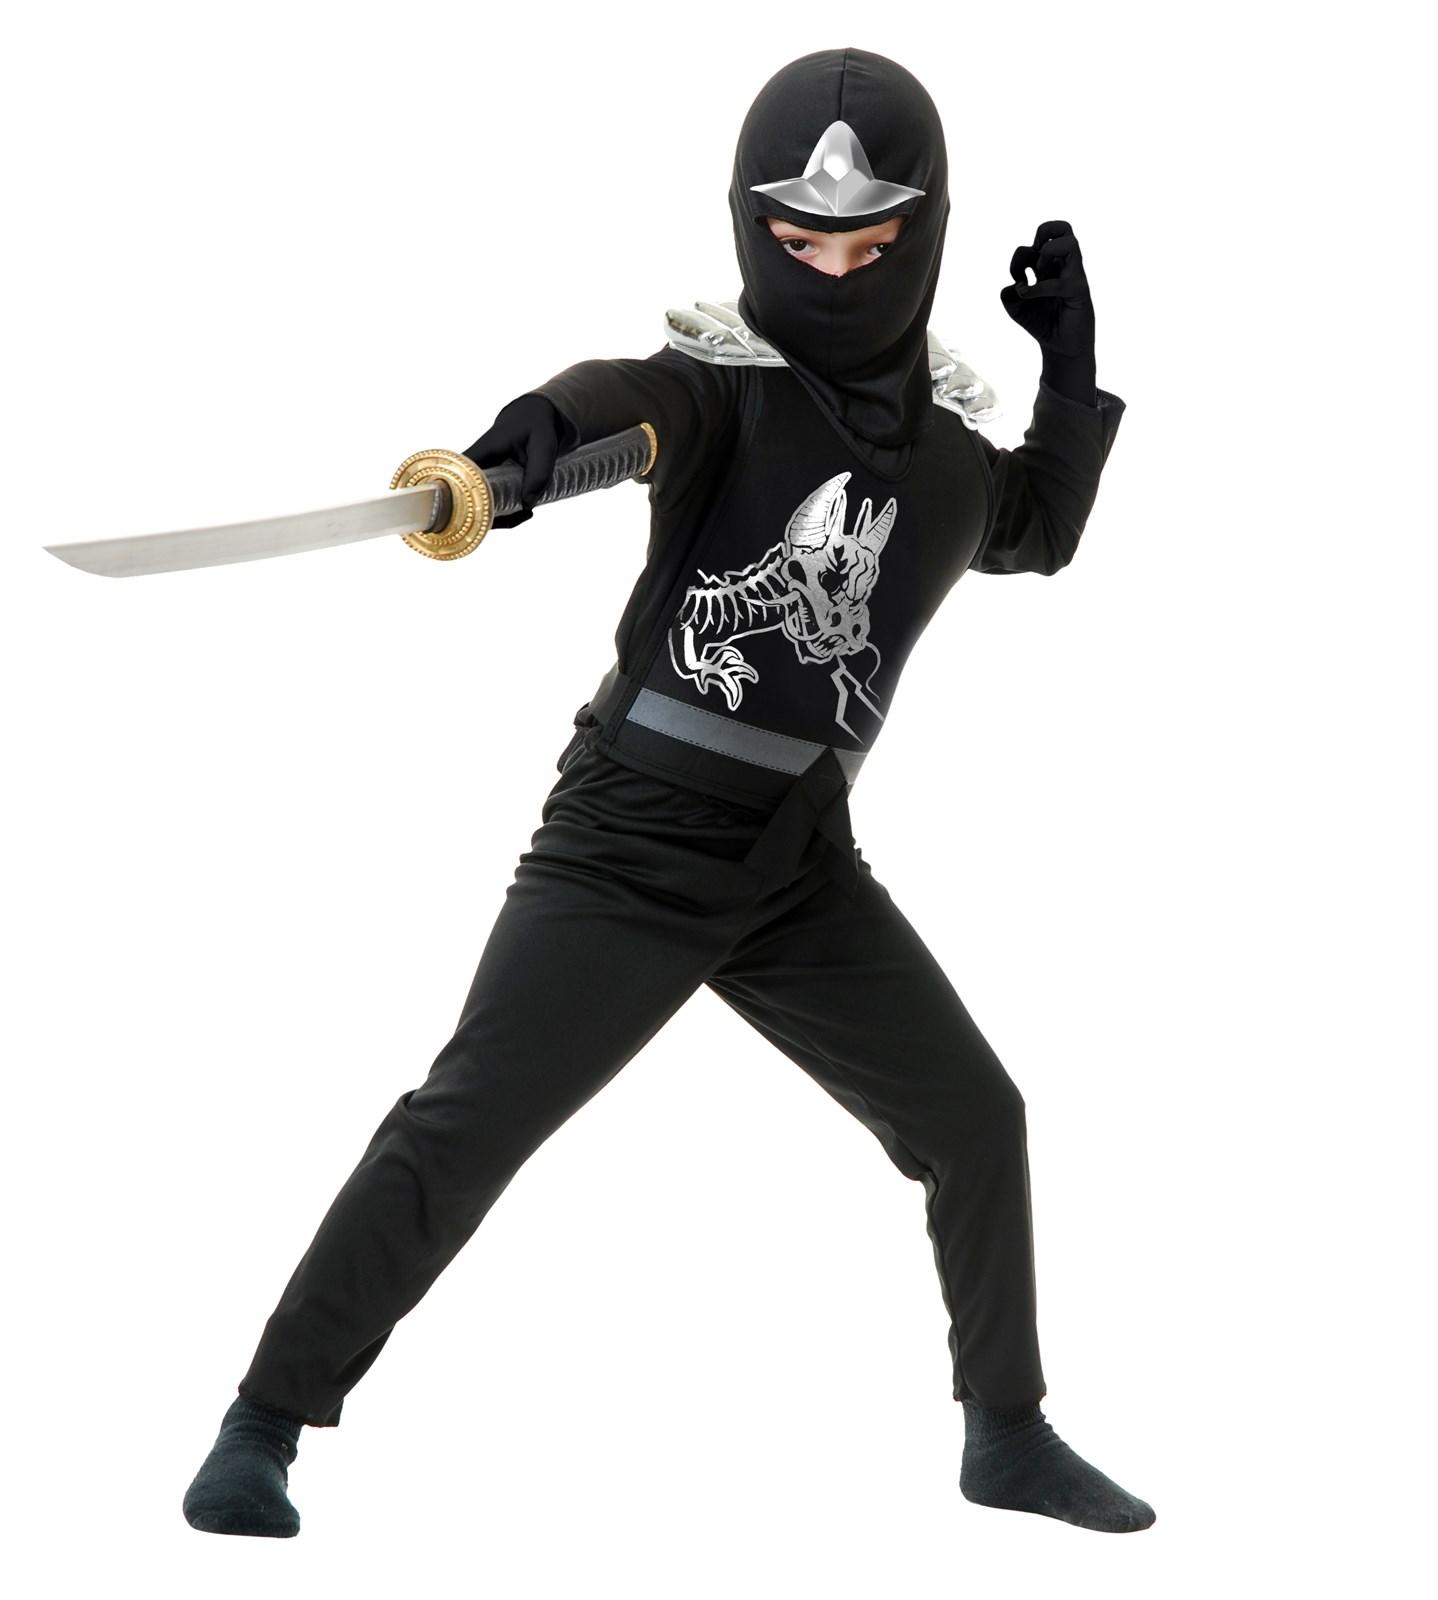 Image of Black Ninja Avengers Series II Toddler Costume